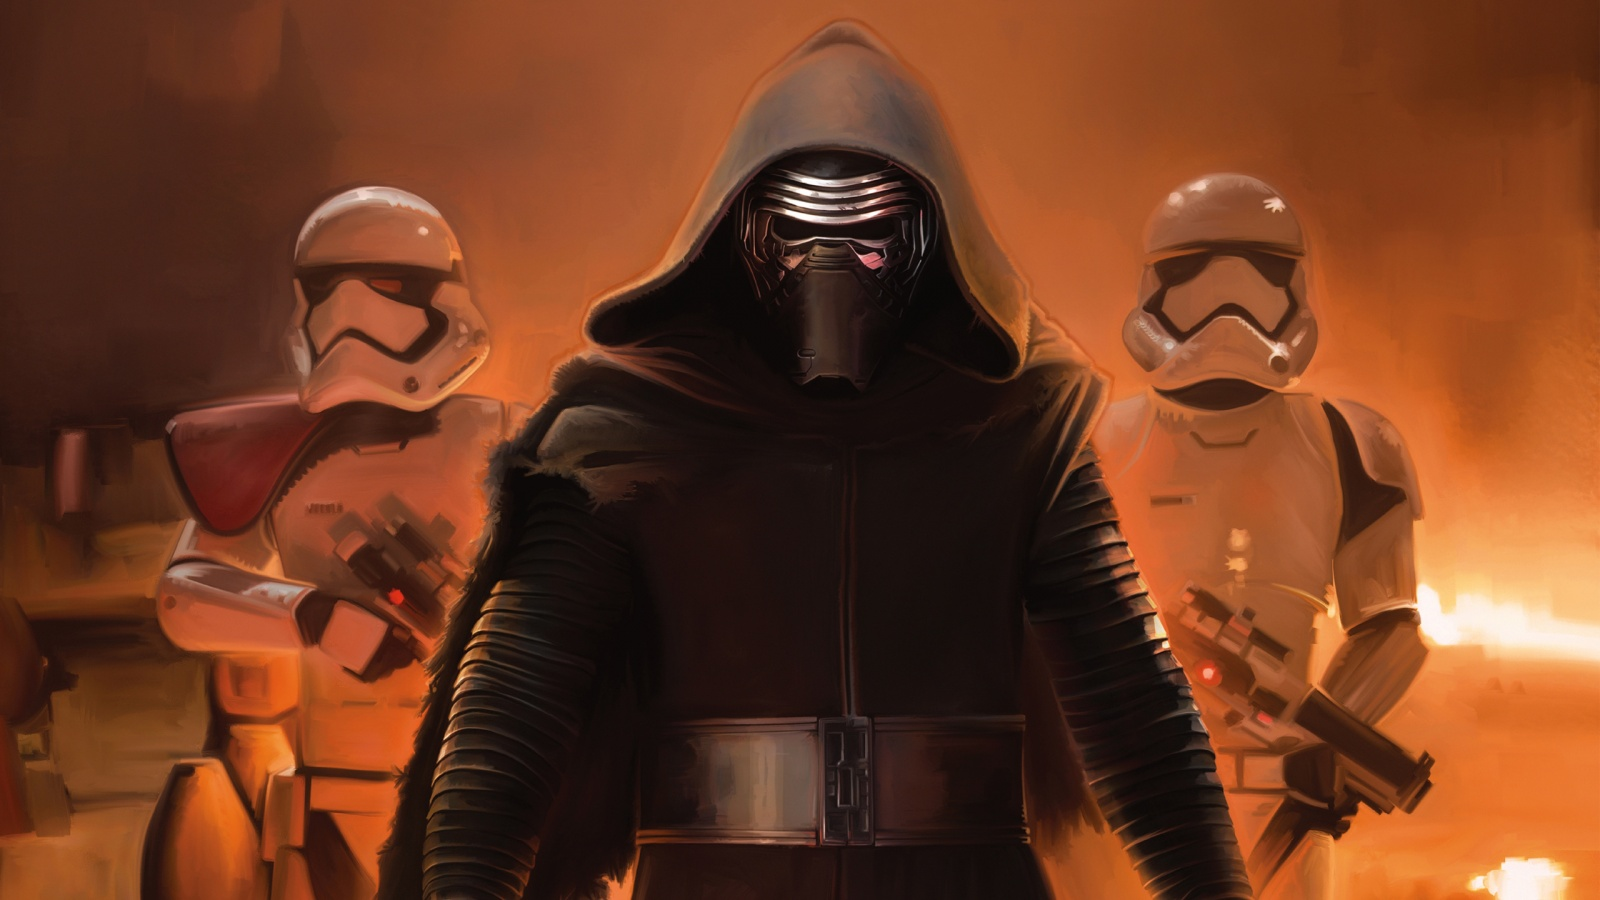 Star Wars The Force Awakens Kylo Ren Wallpapers HD Wallpapers 1600x900